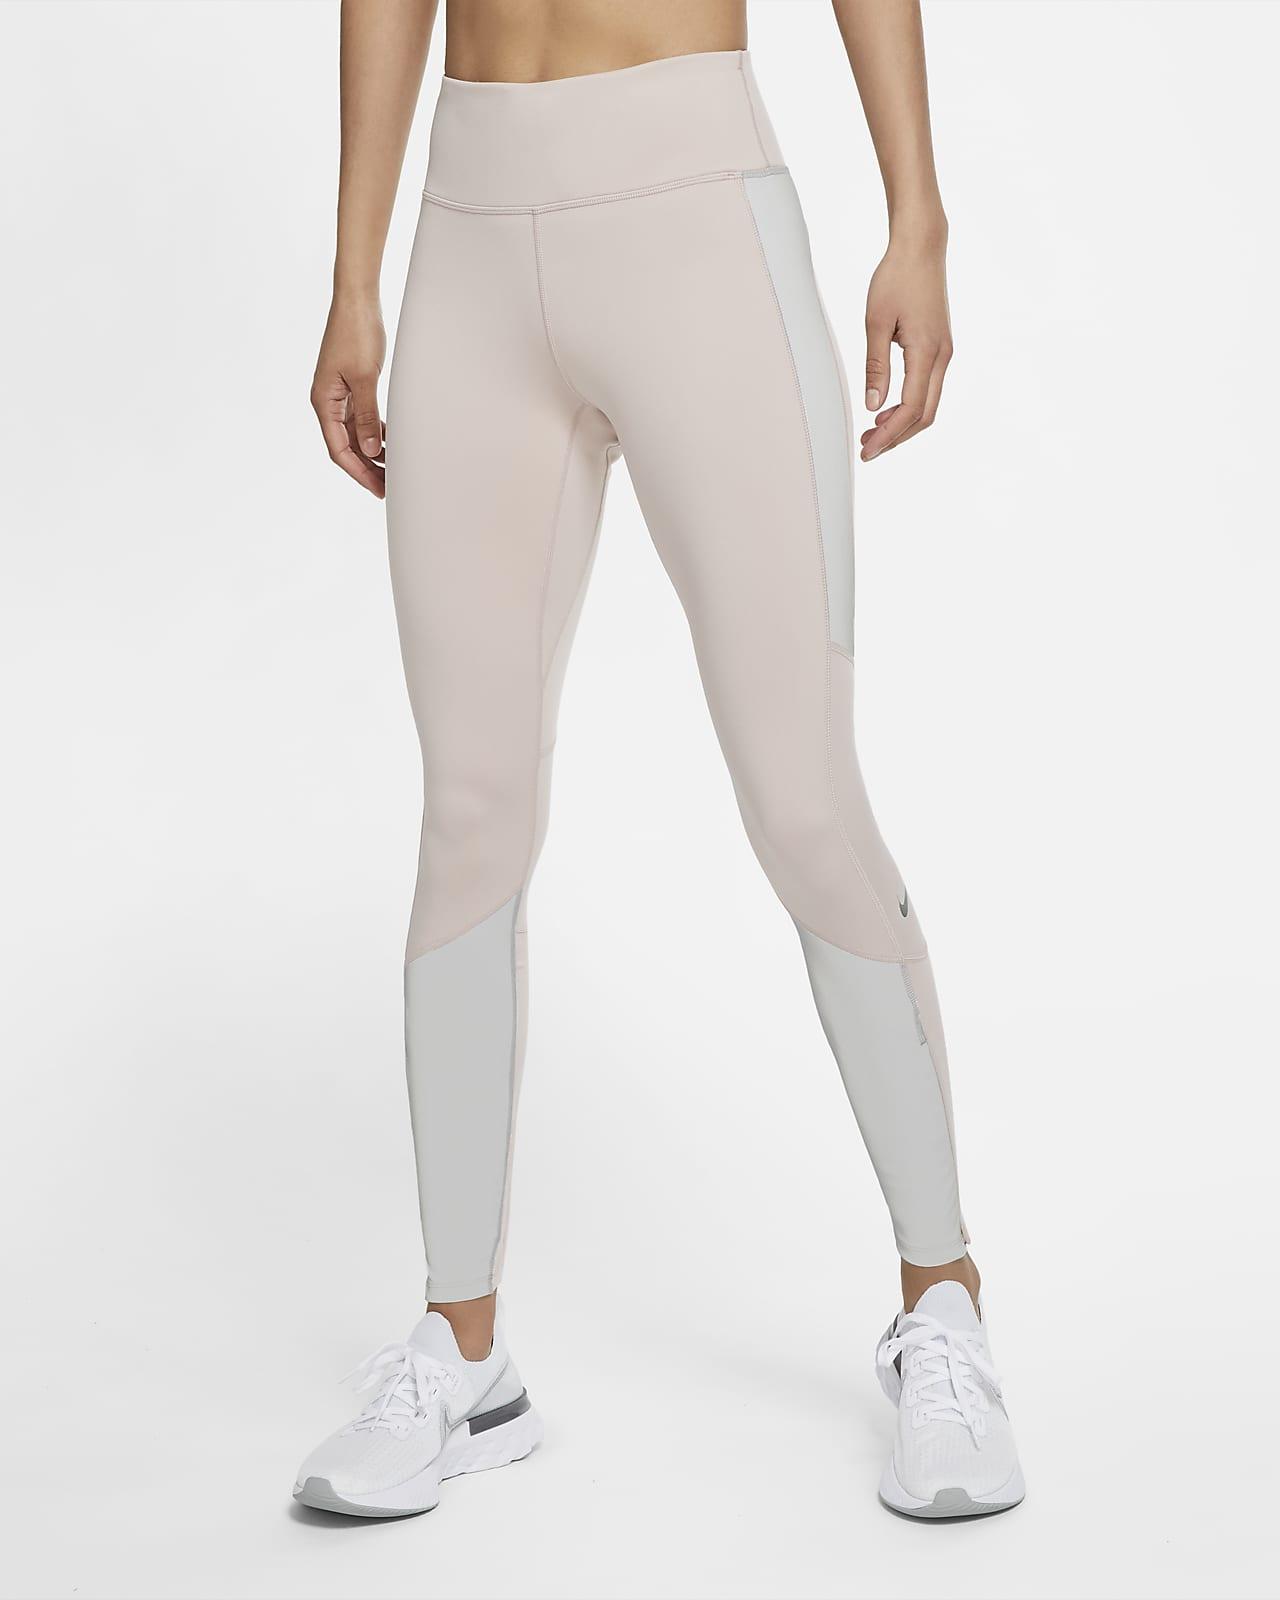 Legging de running Nike Epic Luxe Run Division Flash pour Femme